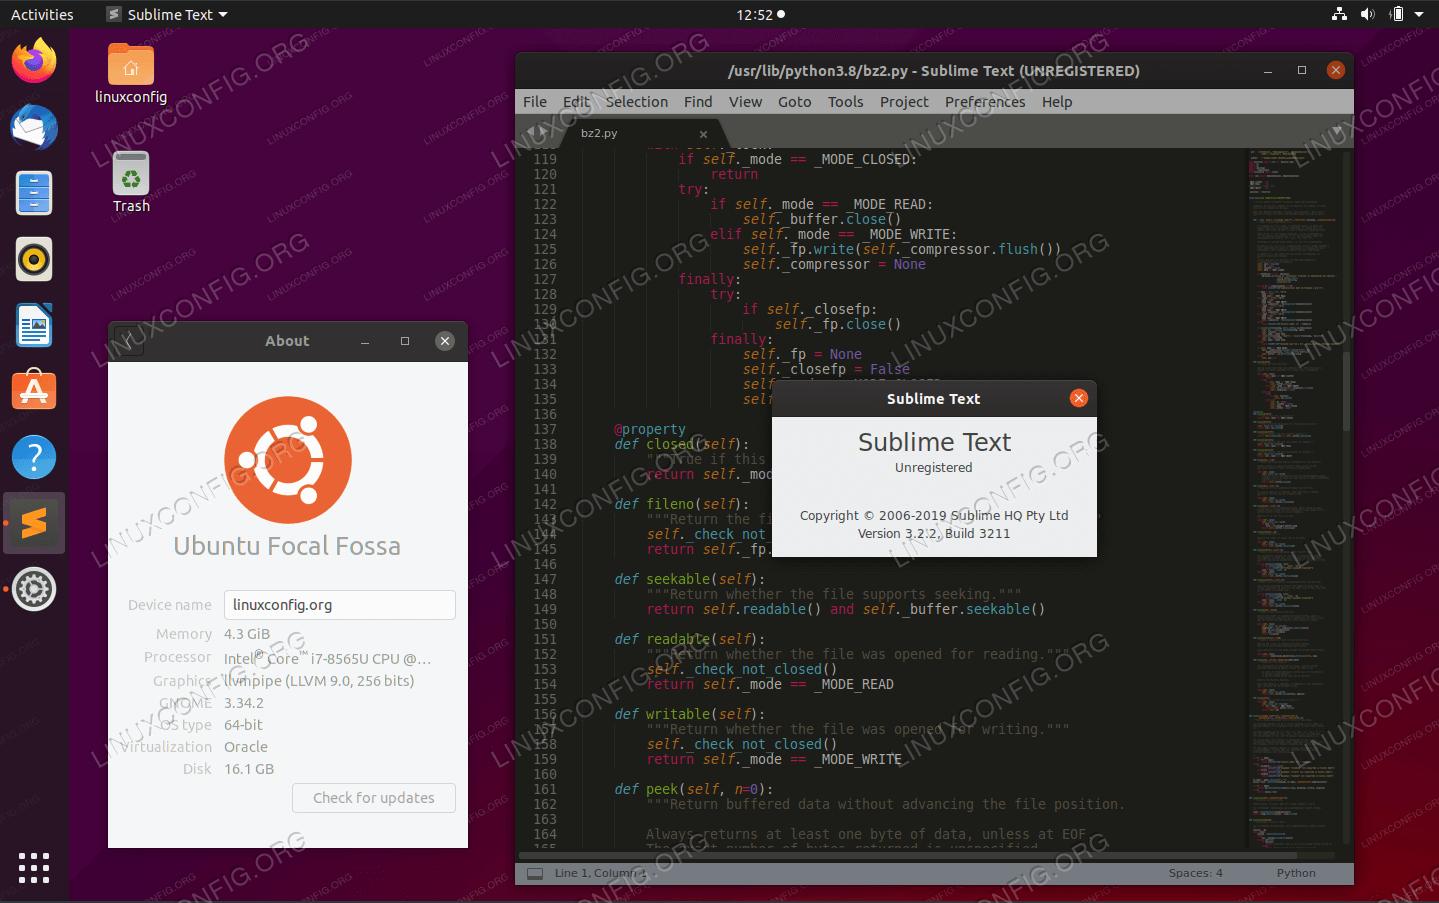 Sublime Text Editor on Ubuntu 20.04